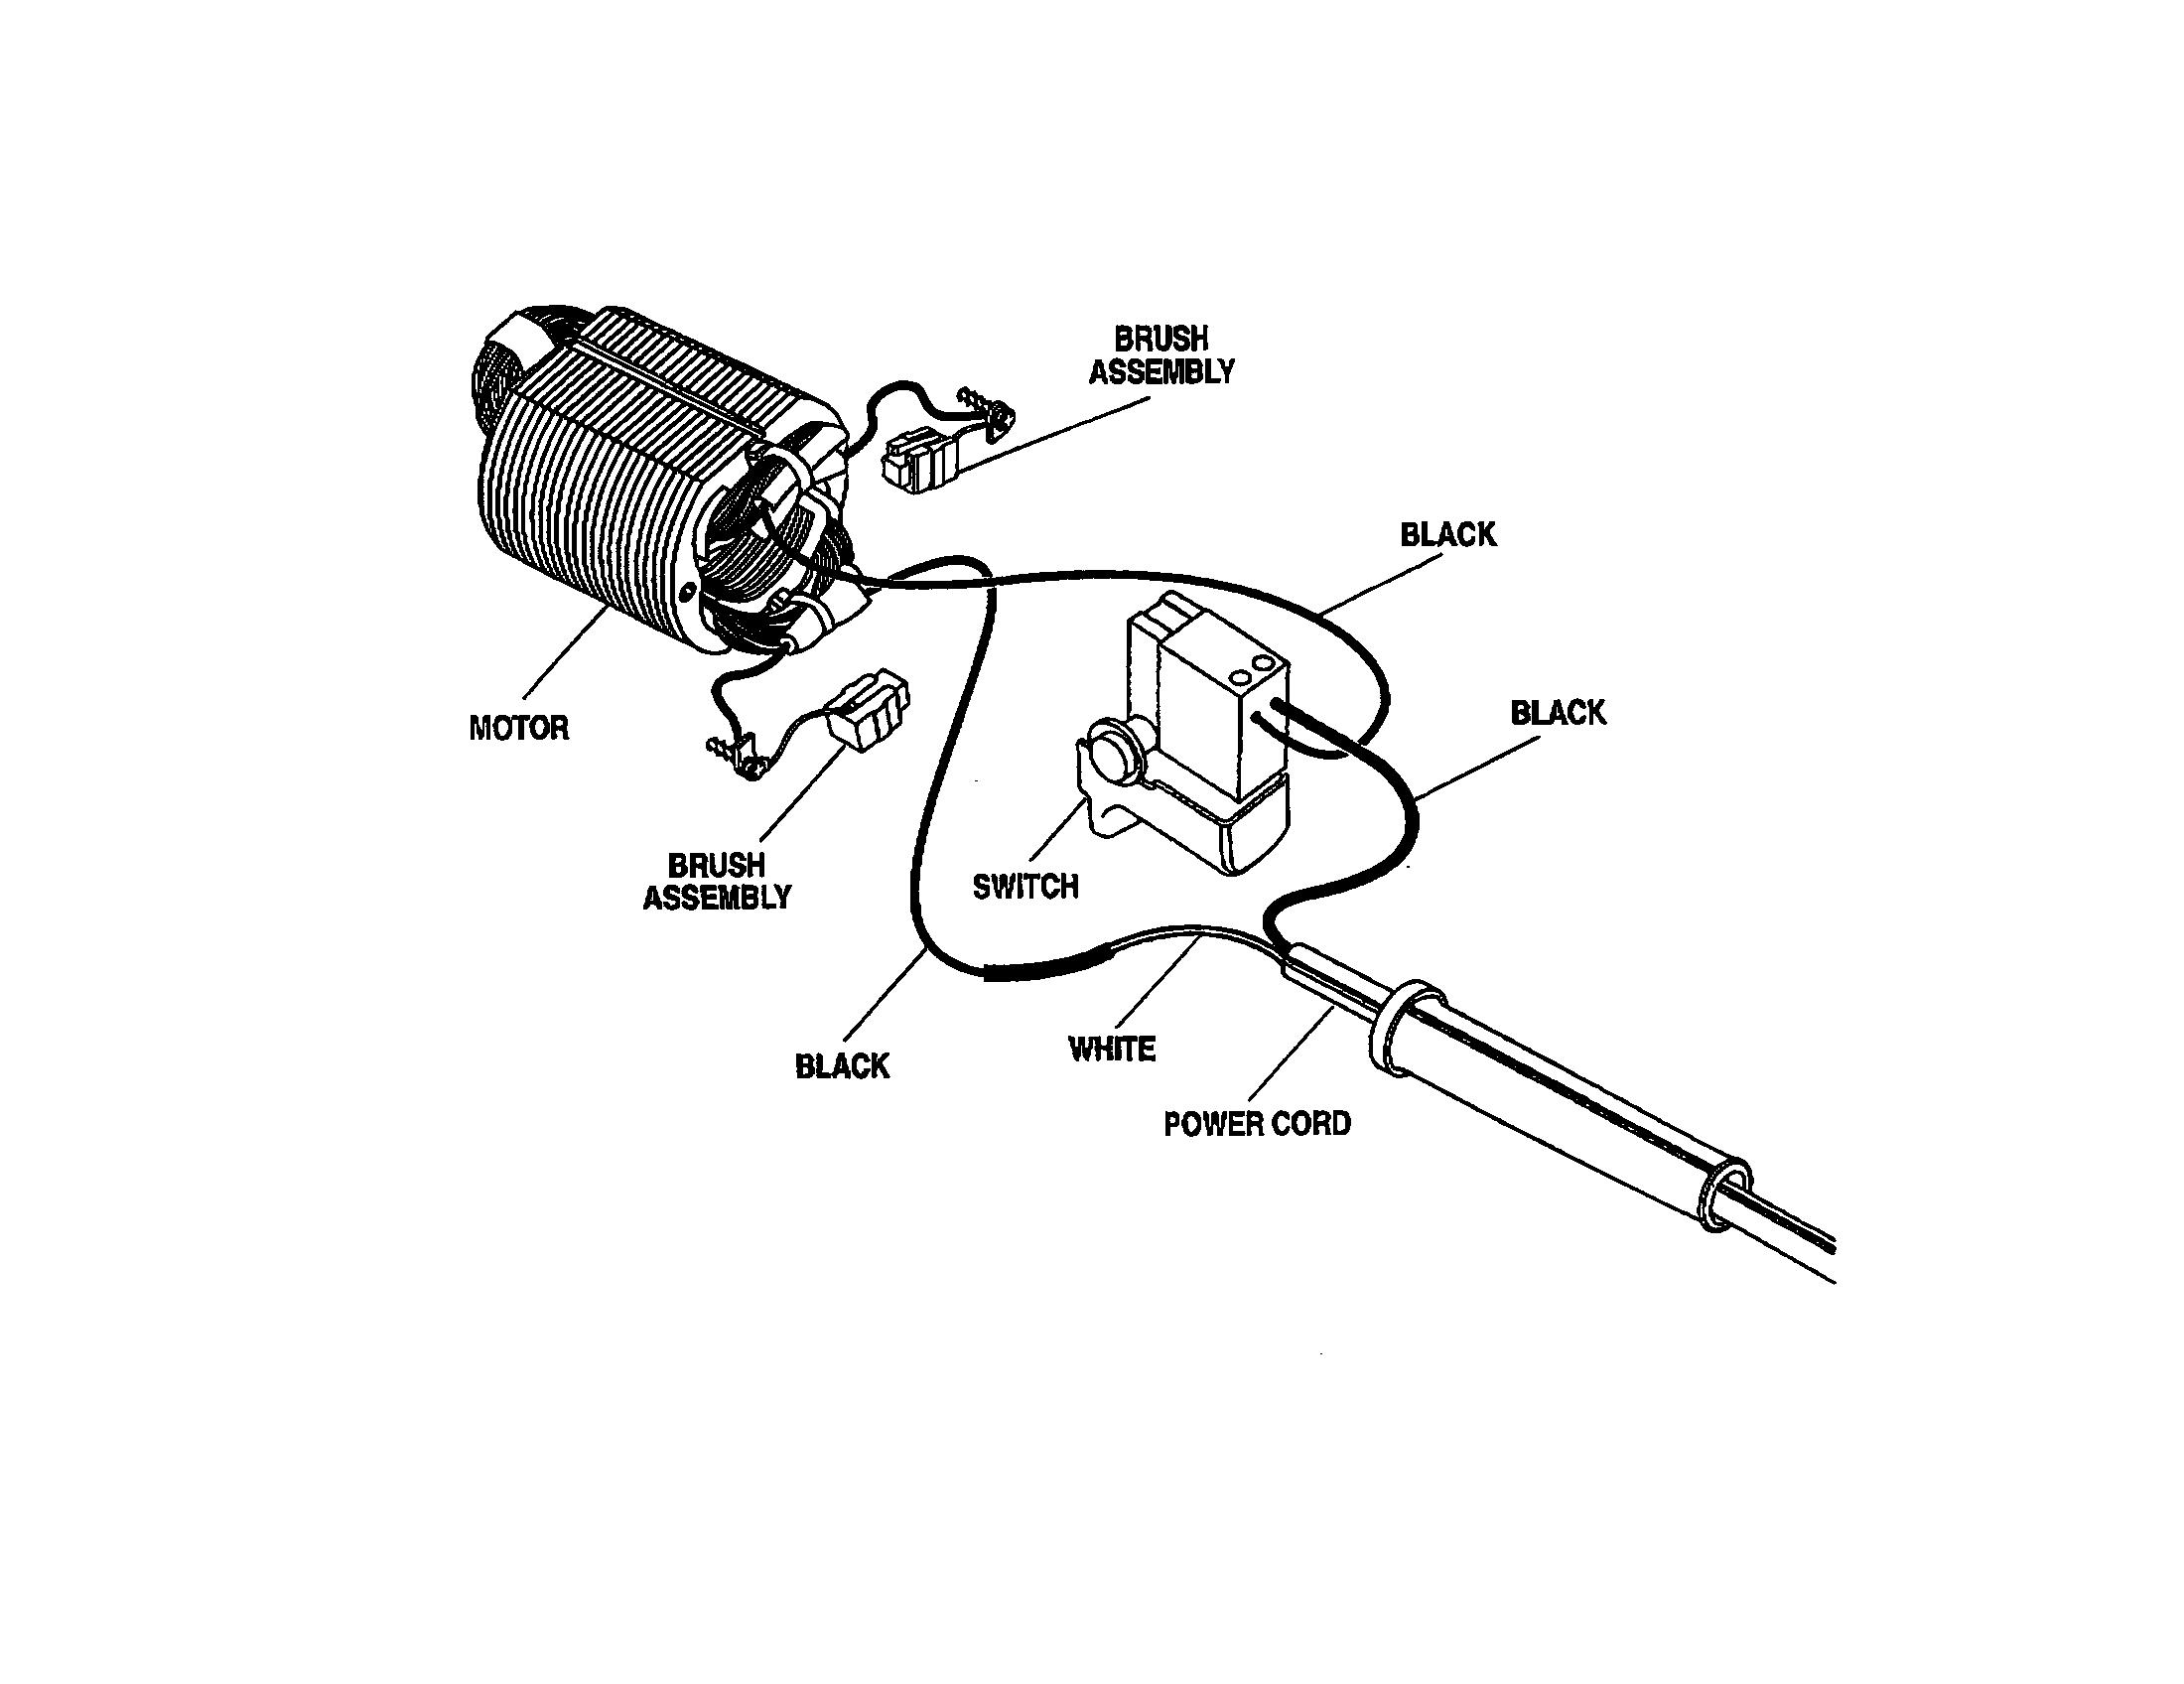 hight resolution of grinder wiring diagram